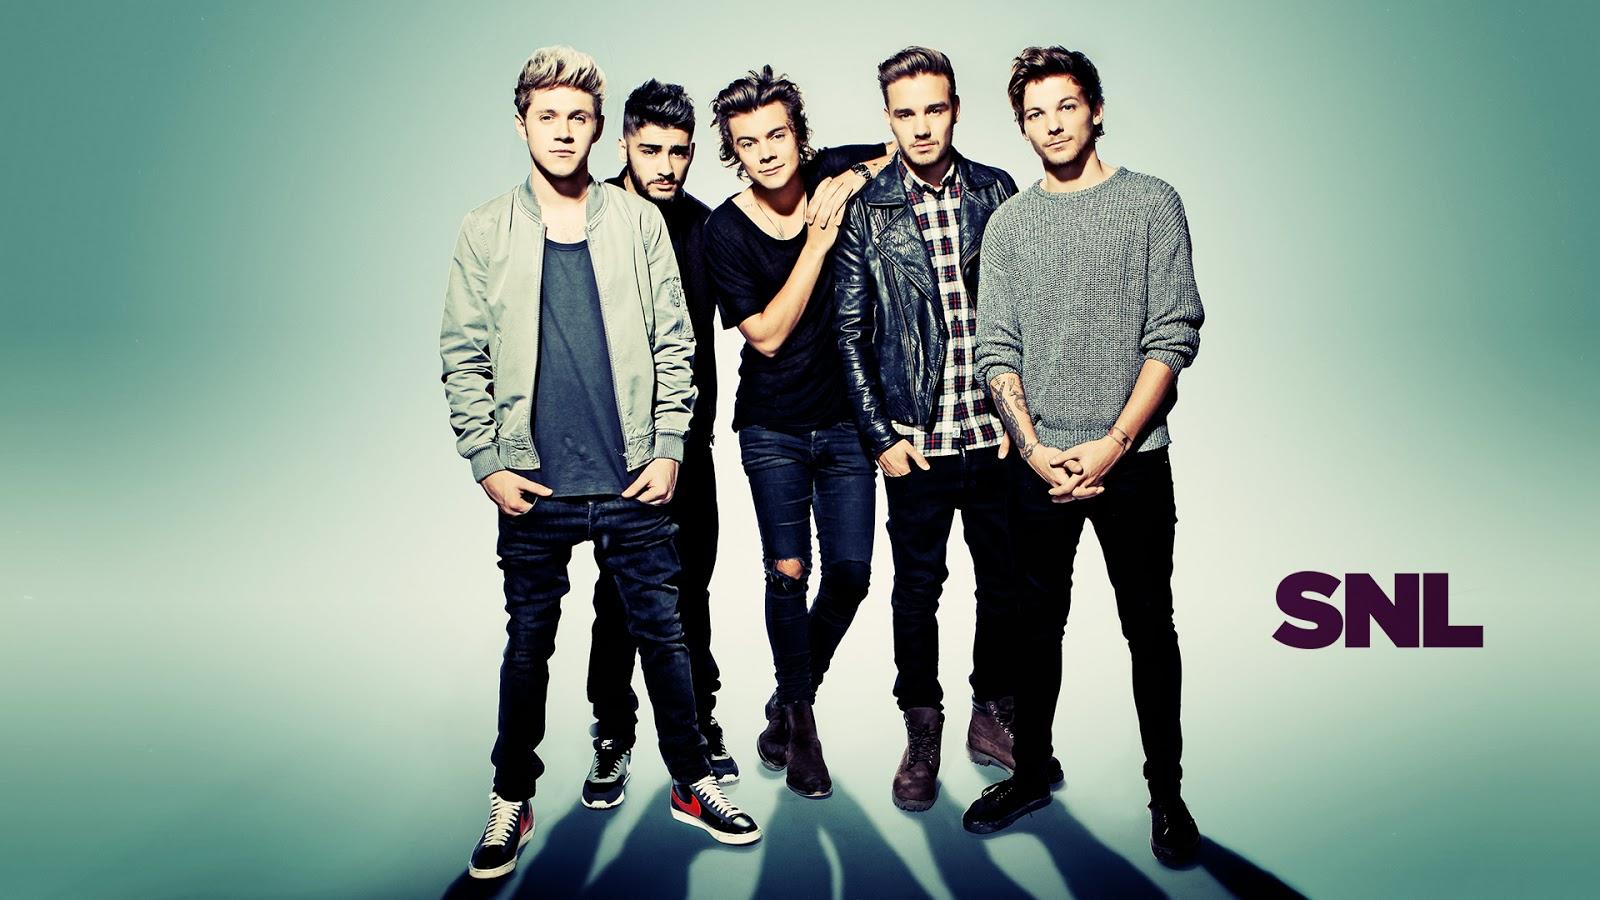 One Direction: Boys' photoshoot - 225.0KB